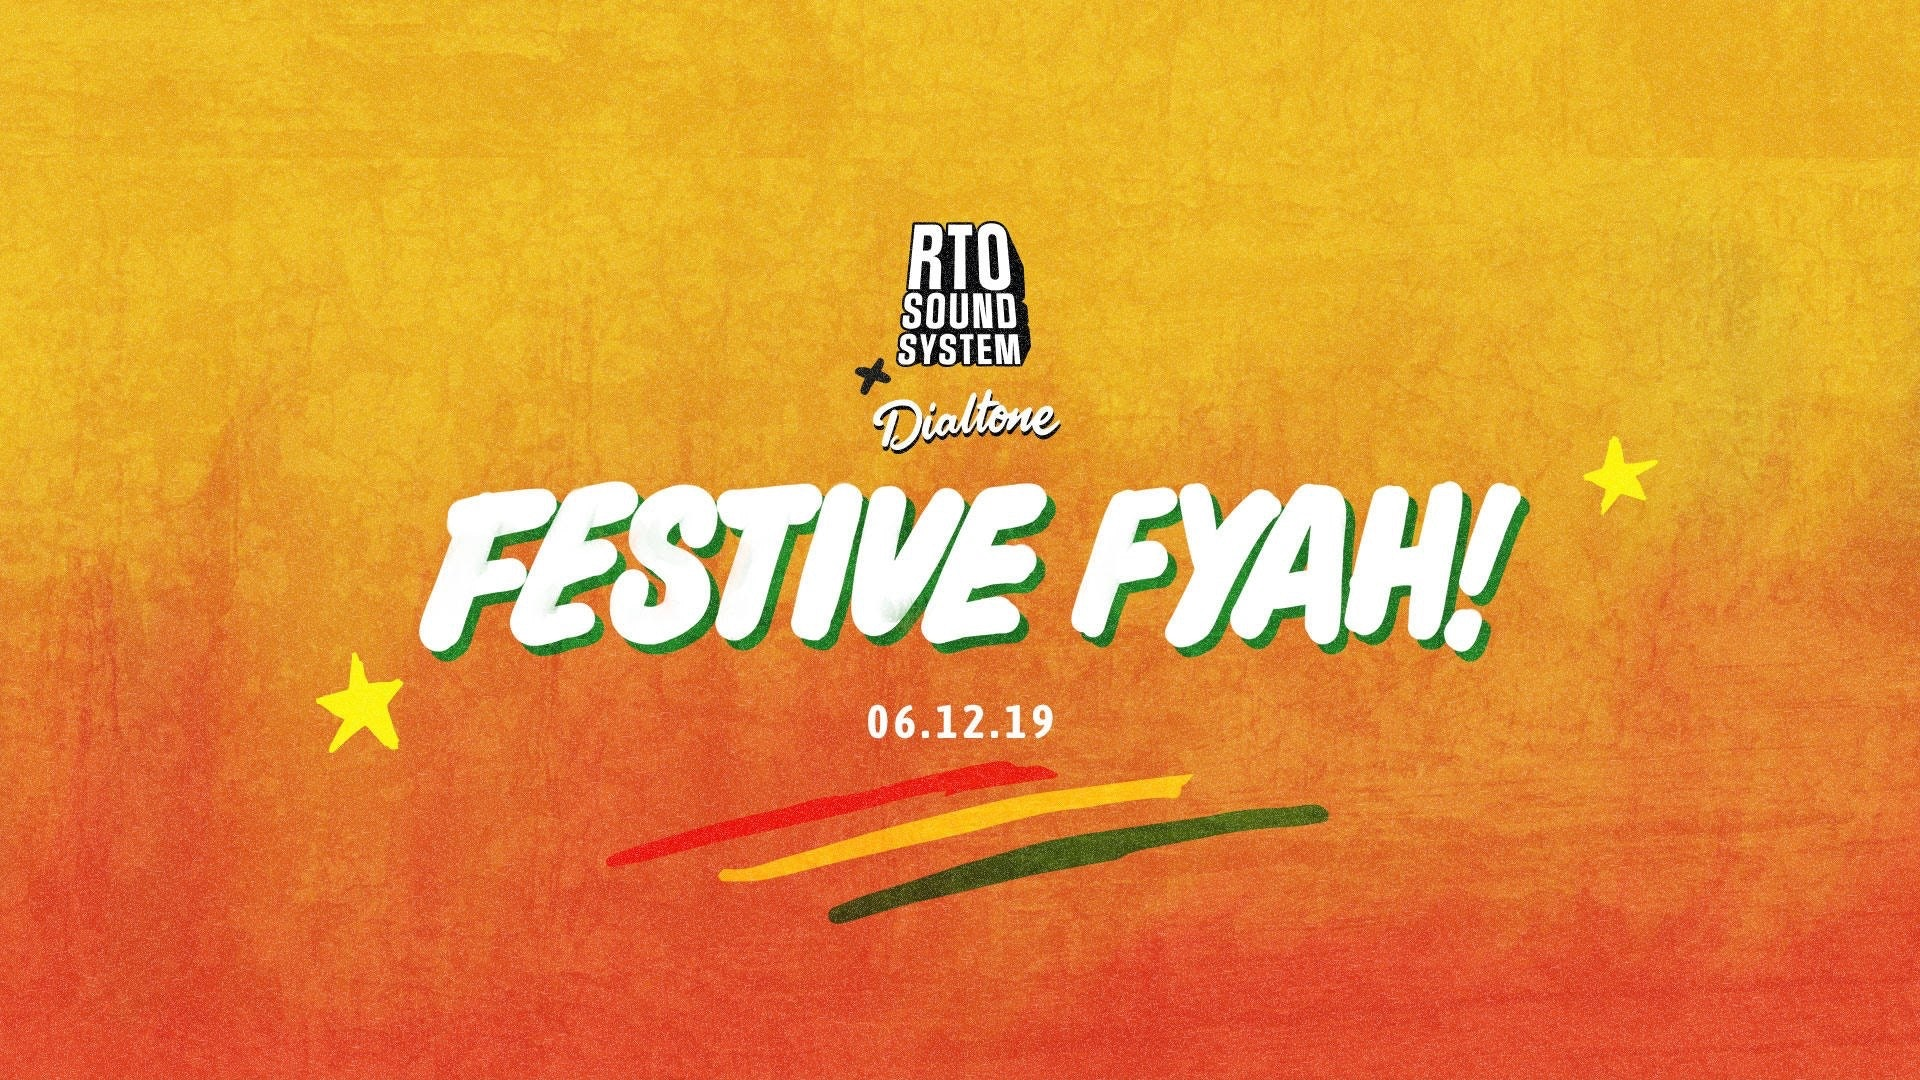 Festive Fyah!